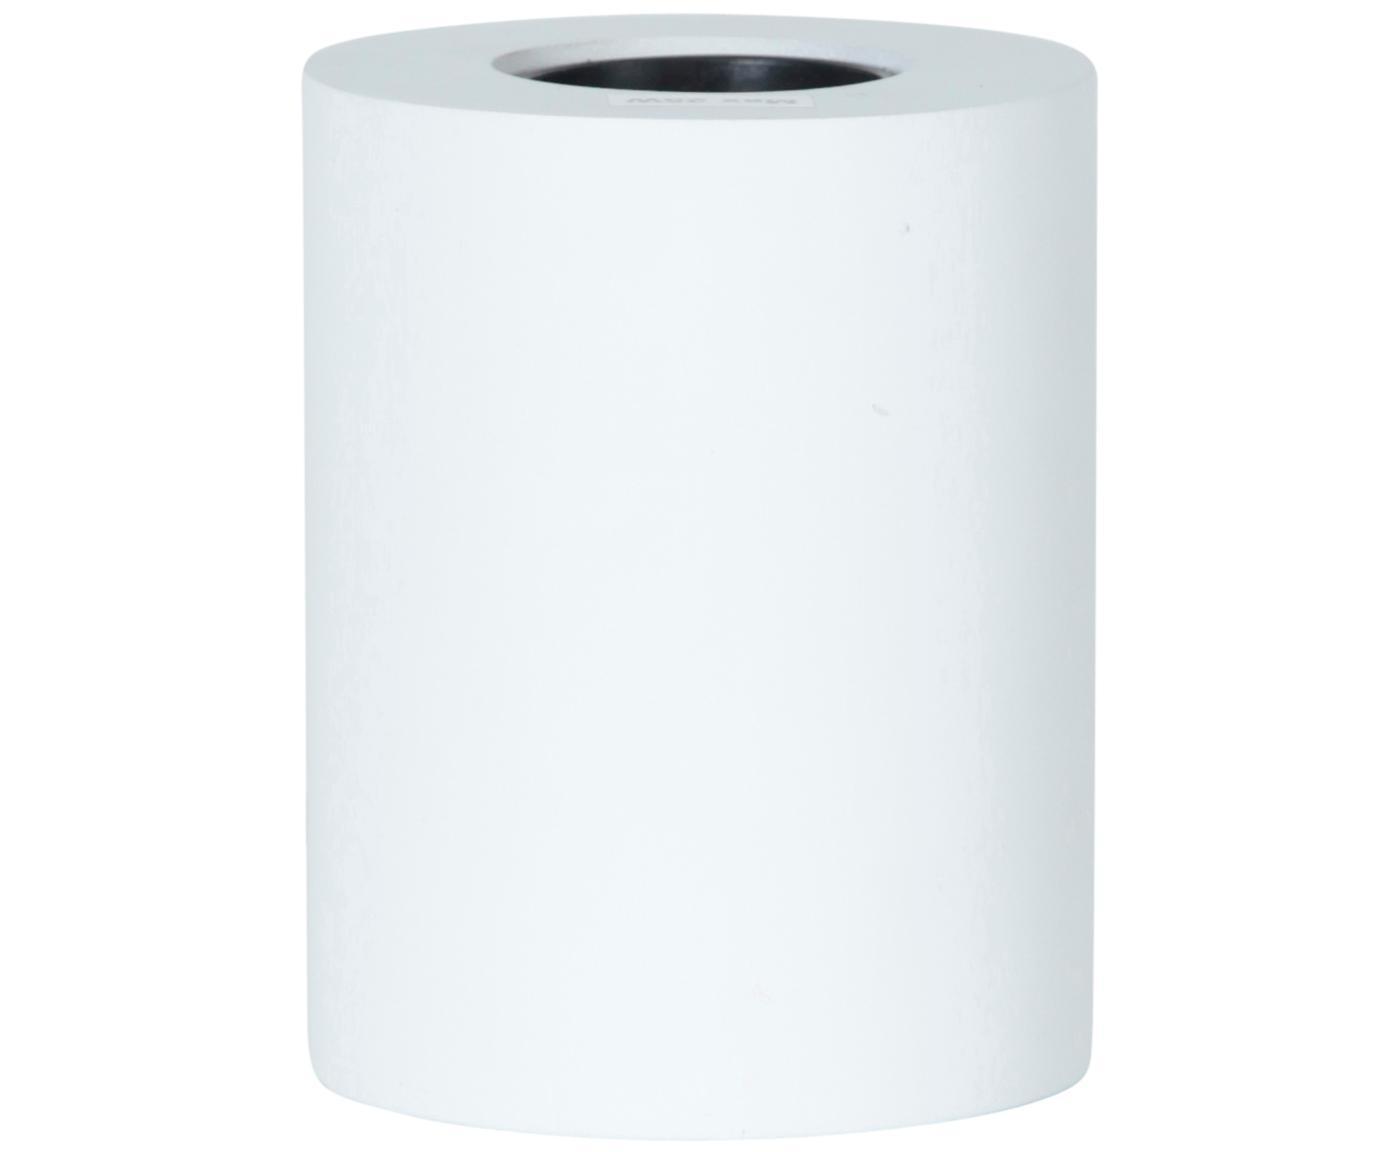 Kleine tafellamp Tub, Wit, Ø 8 x H 10 cm